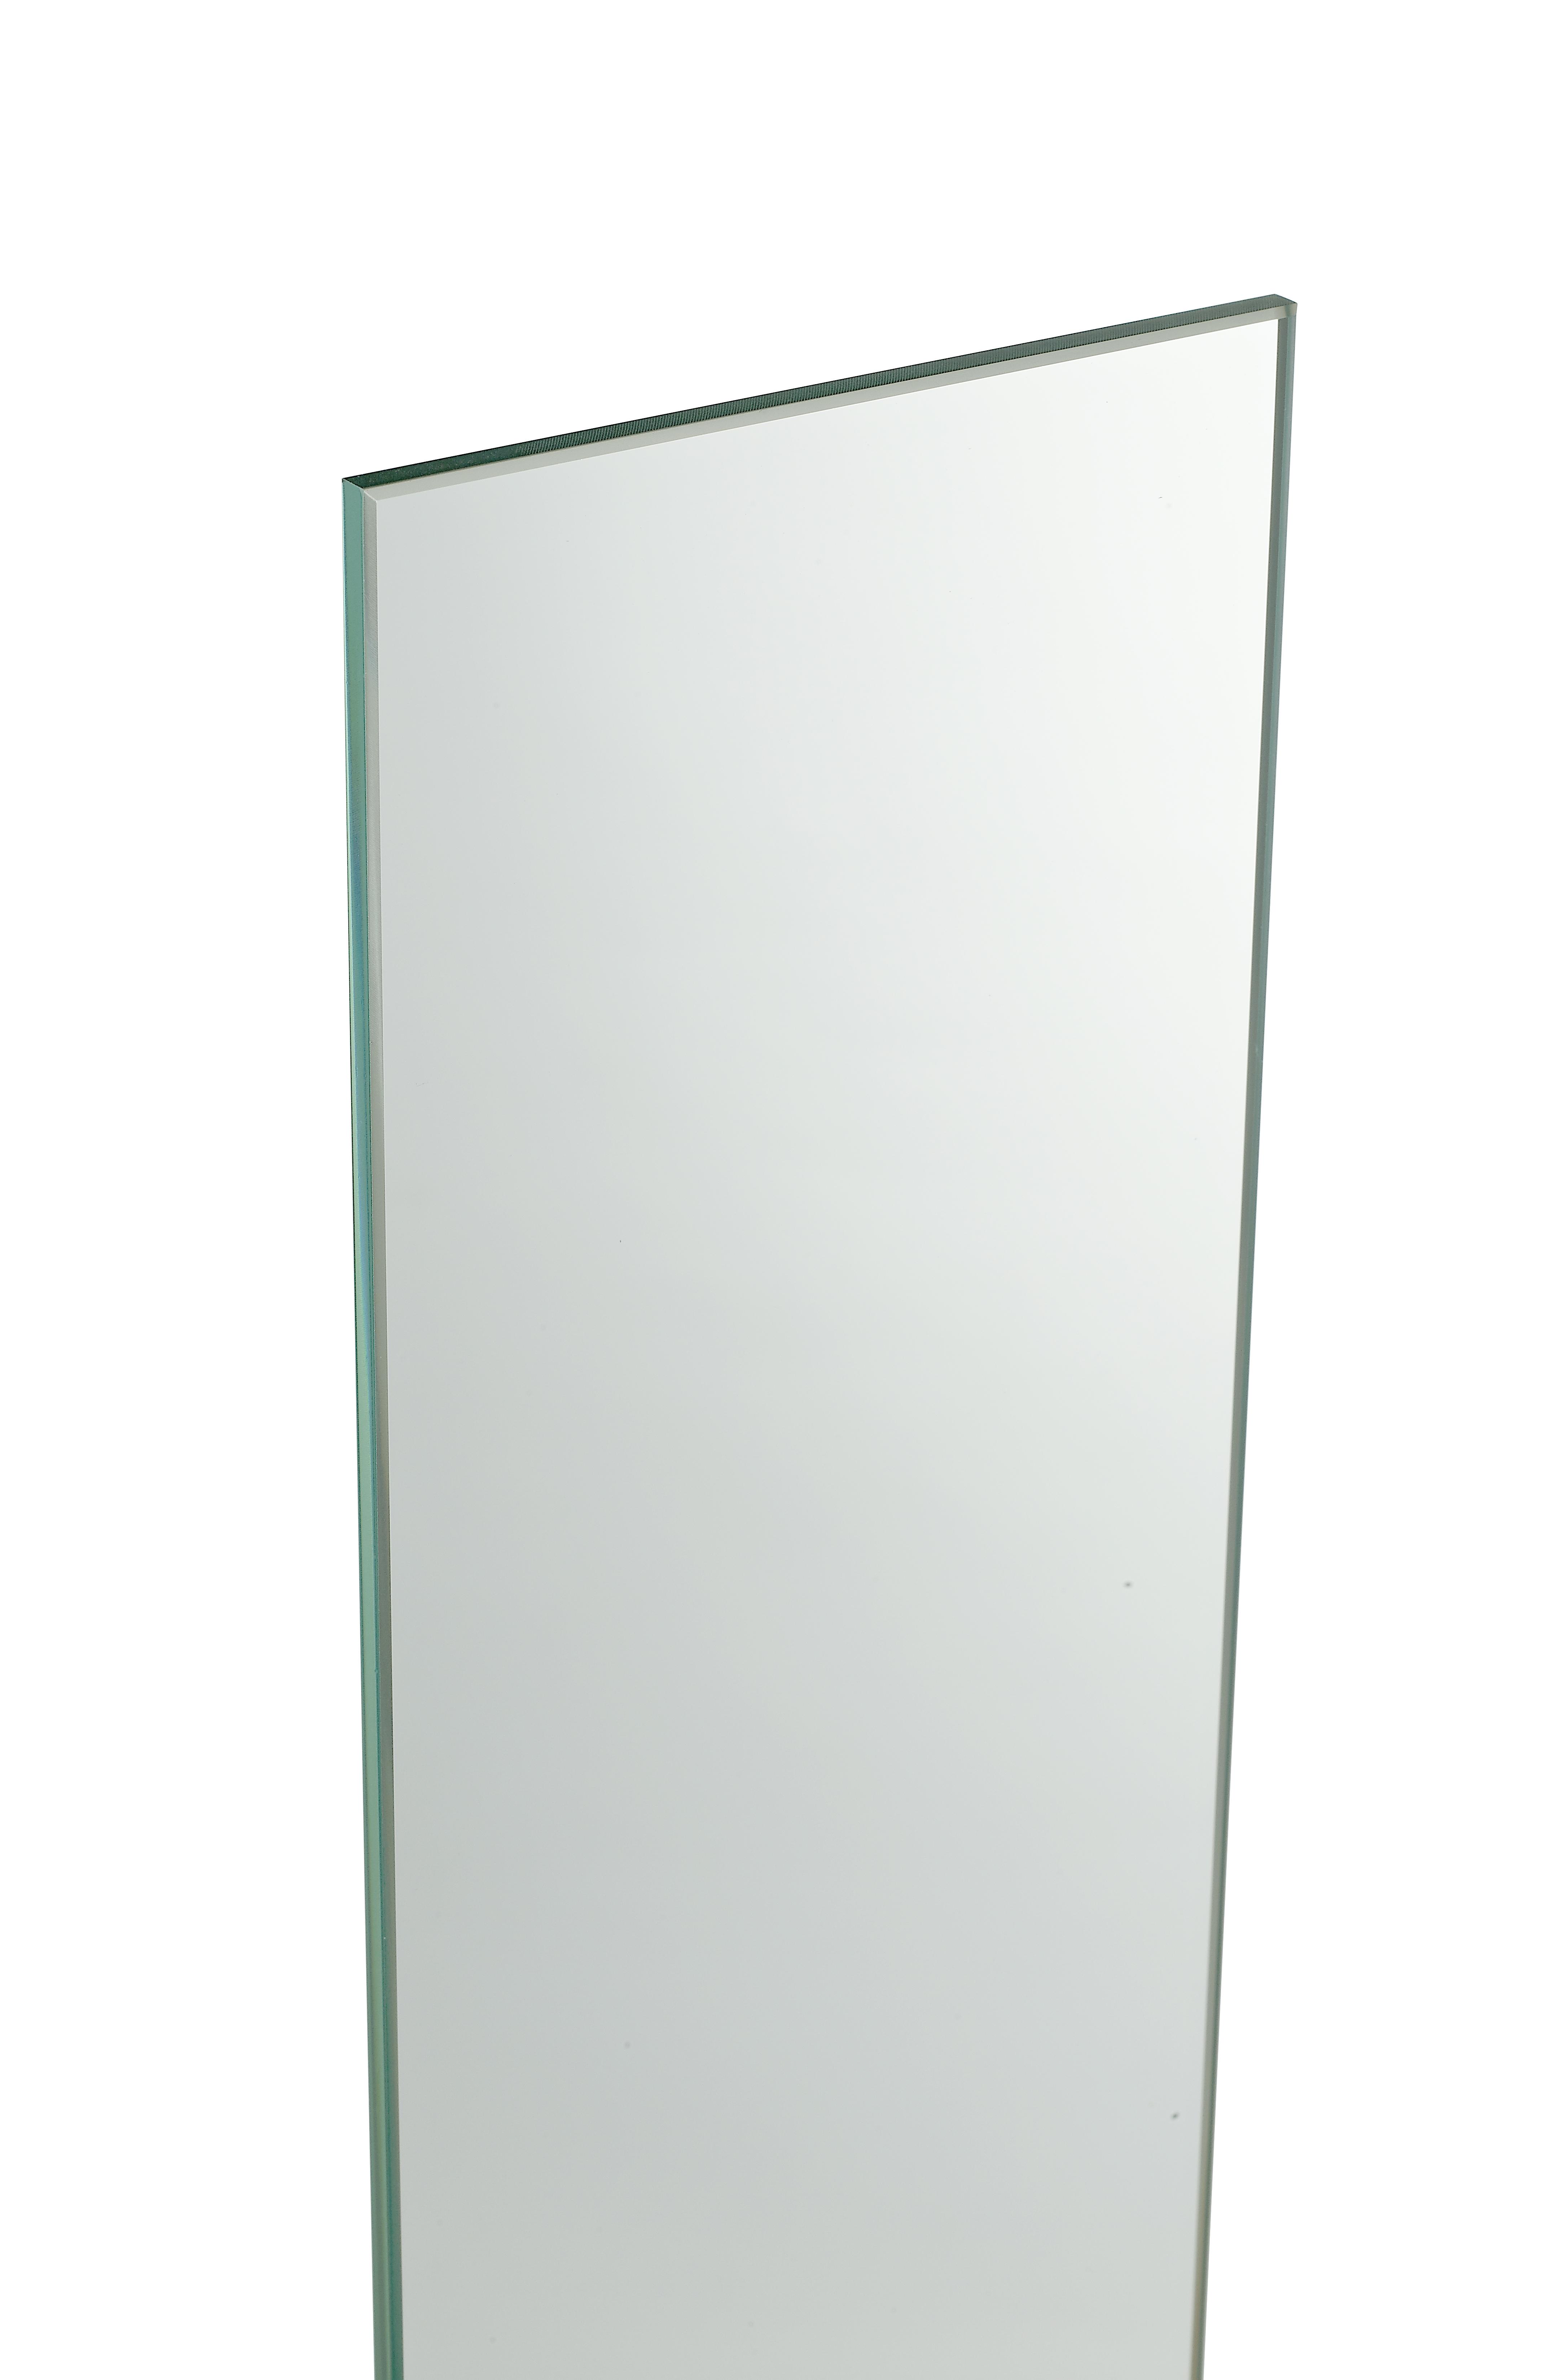 4 Glass Panels 876 Not Including Brackets